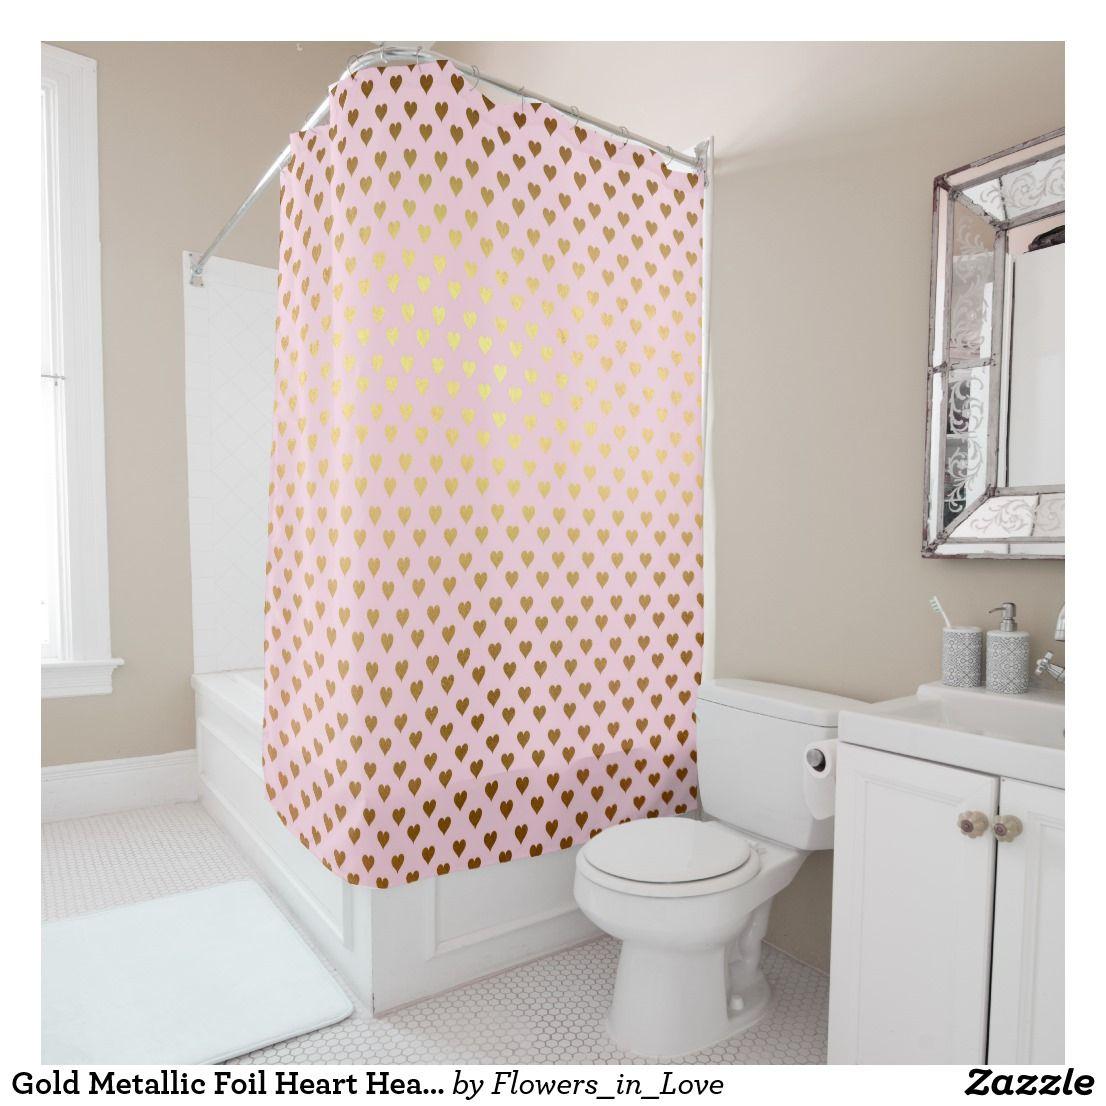 Making nautical bathroom d 233 cor by yourself bathroom designs ideas - Gold Metallic Foil Heart Hearts Love Pink Modern Shower Curtain